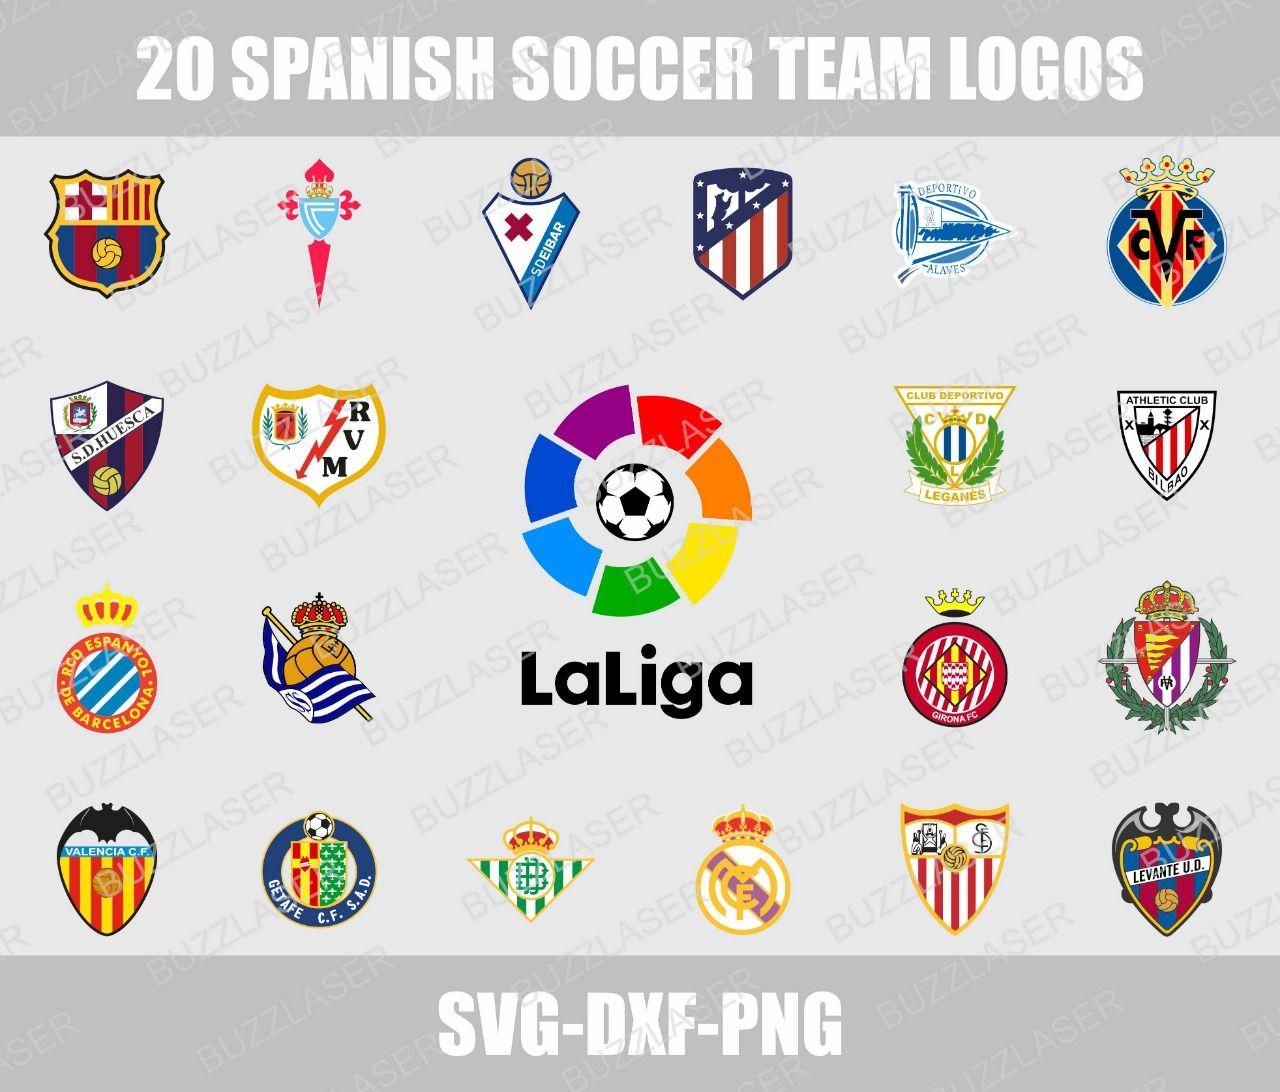 20 Spanish Soccer Team Logos The Globe